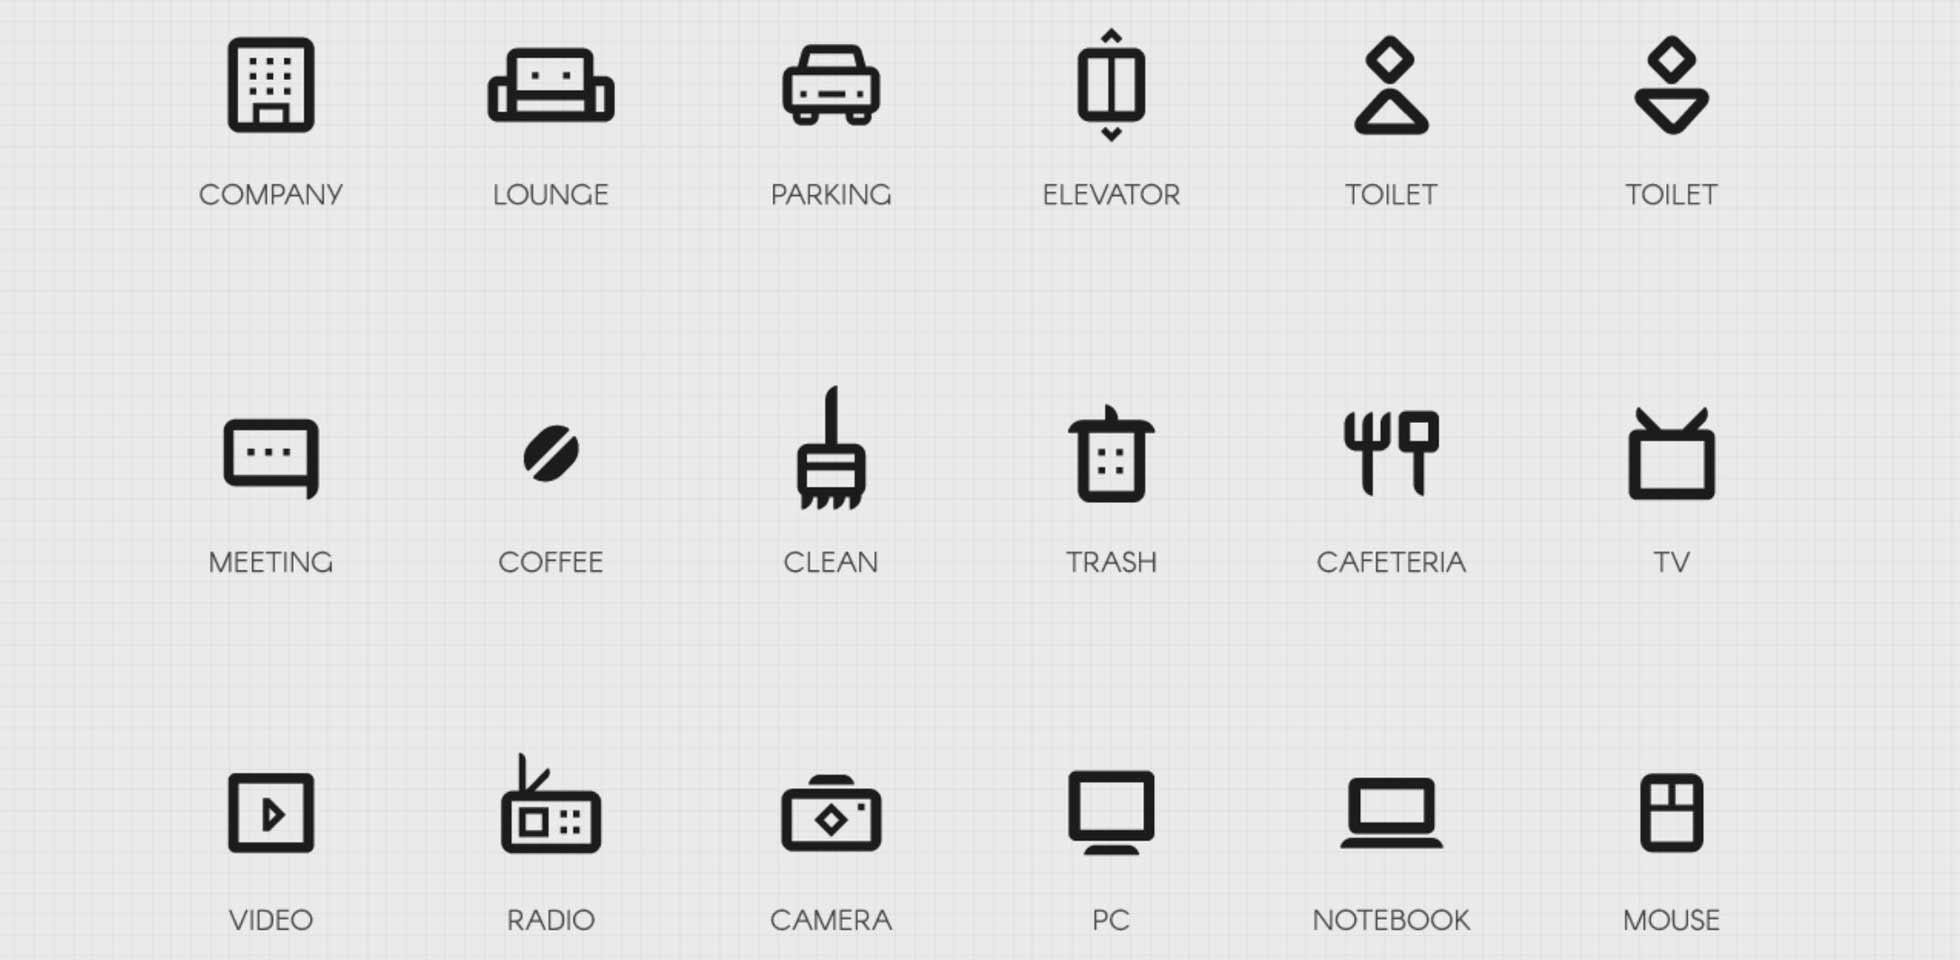 Free Download: Company Icon Set